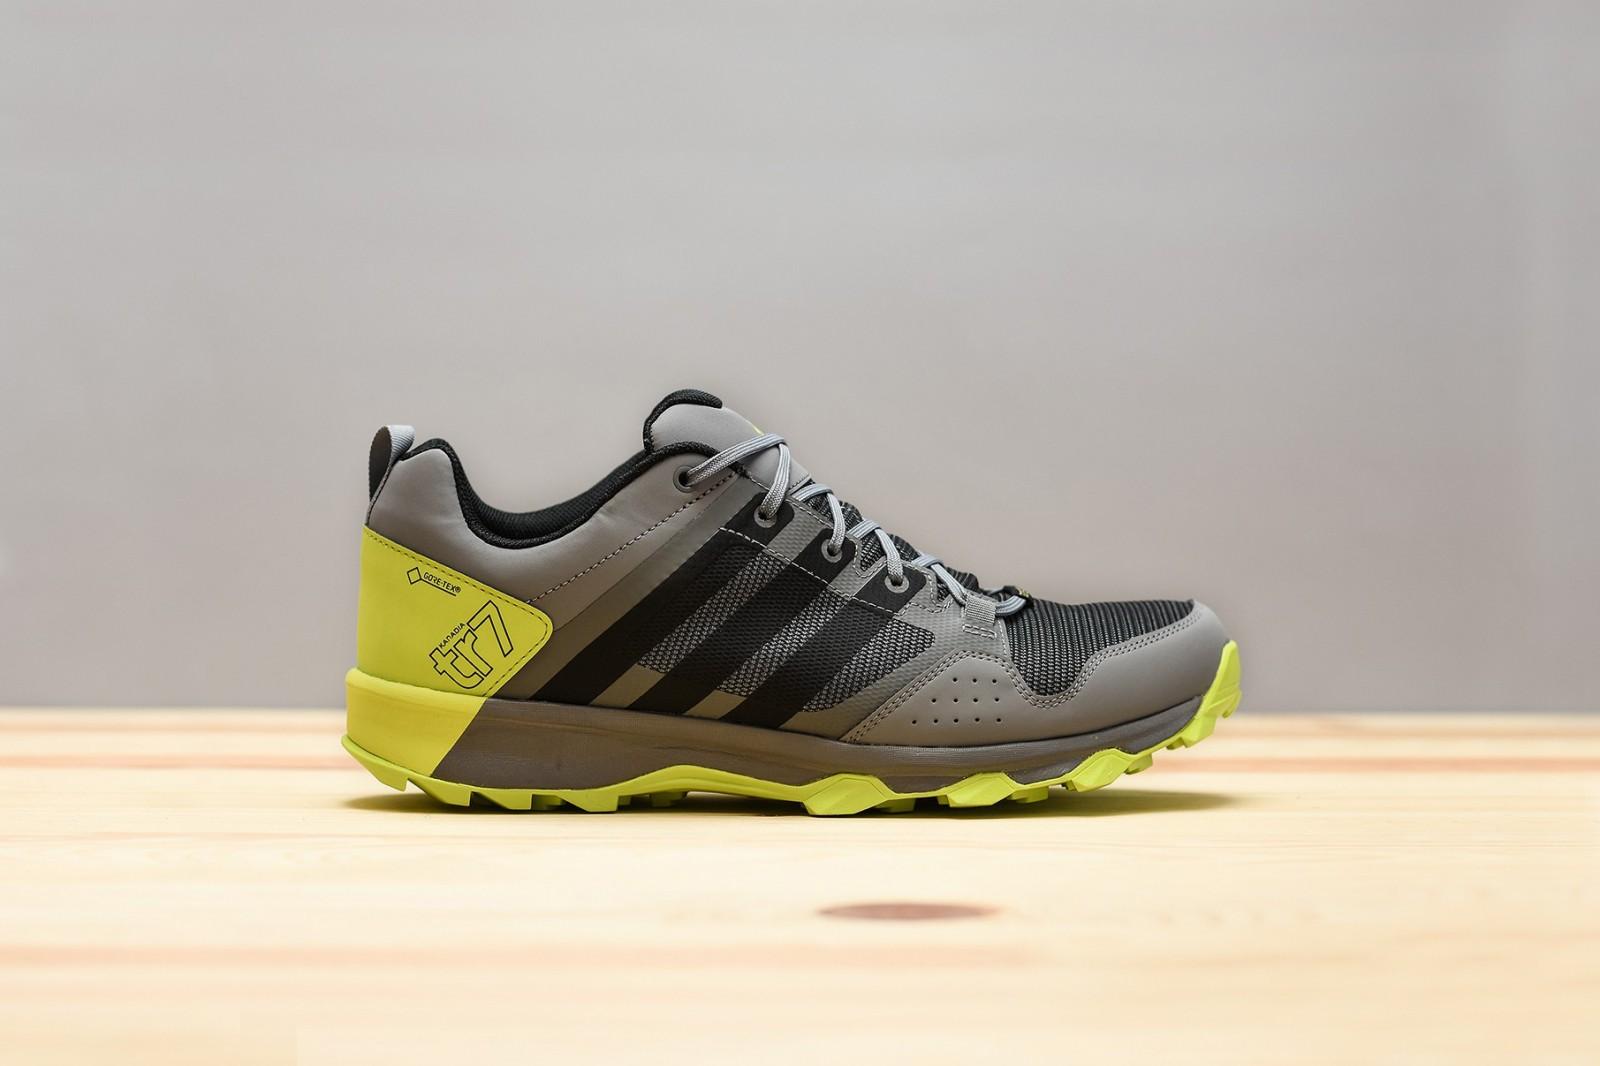 618e2b62b9c Pánská běžecká obuv adidas Performance KANADIA 7 TR GTX